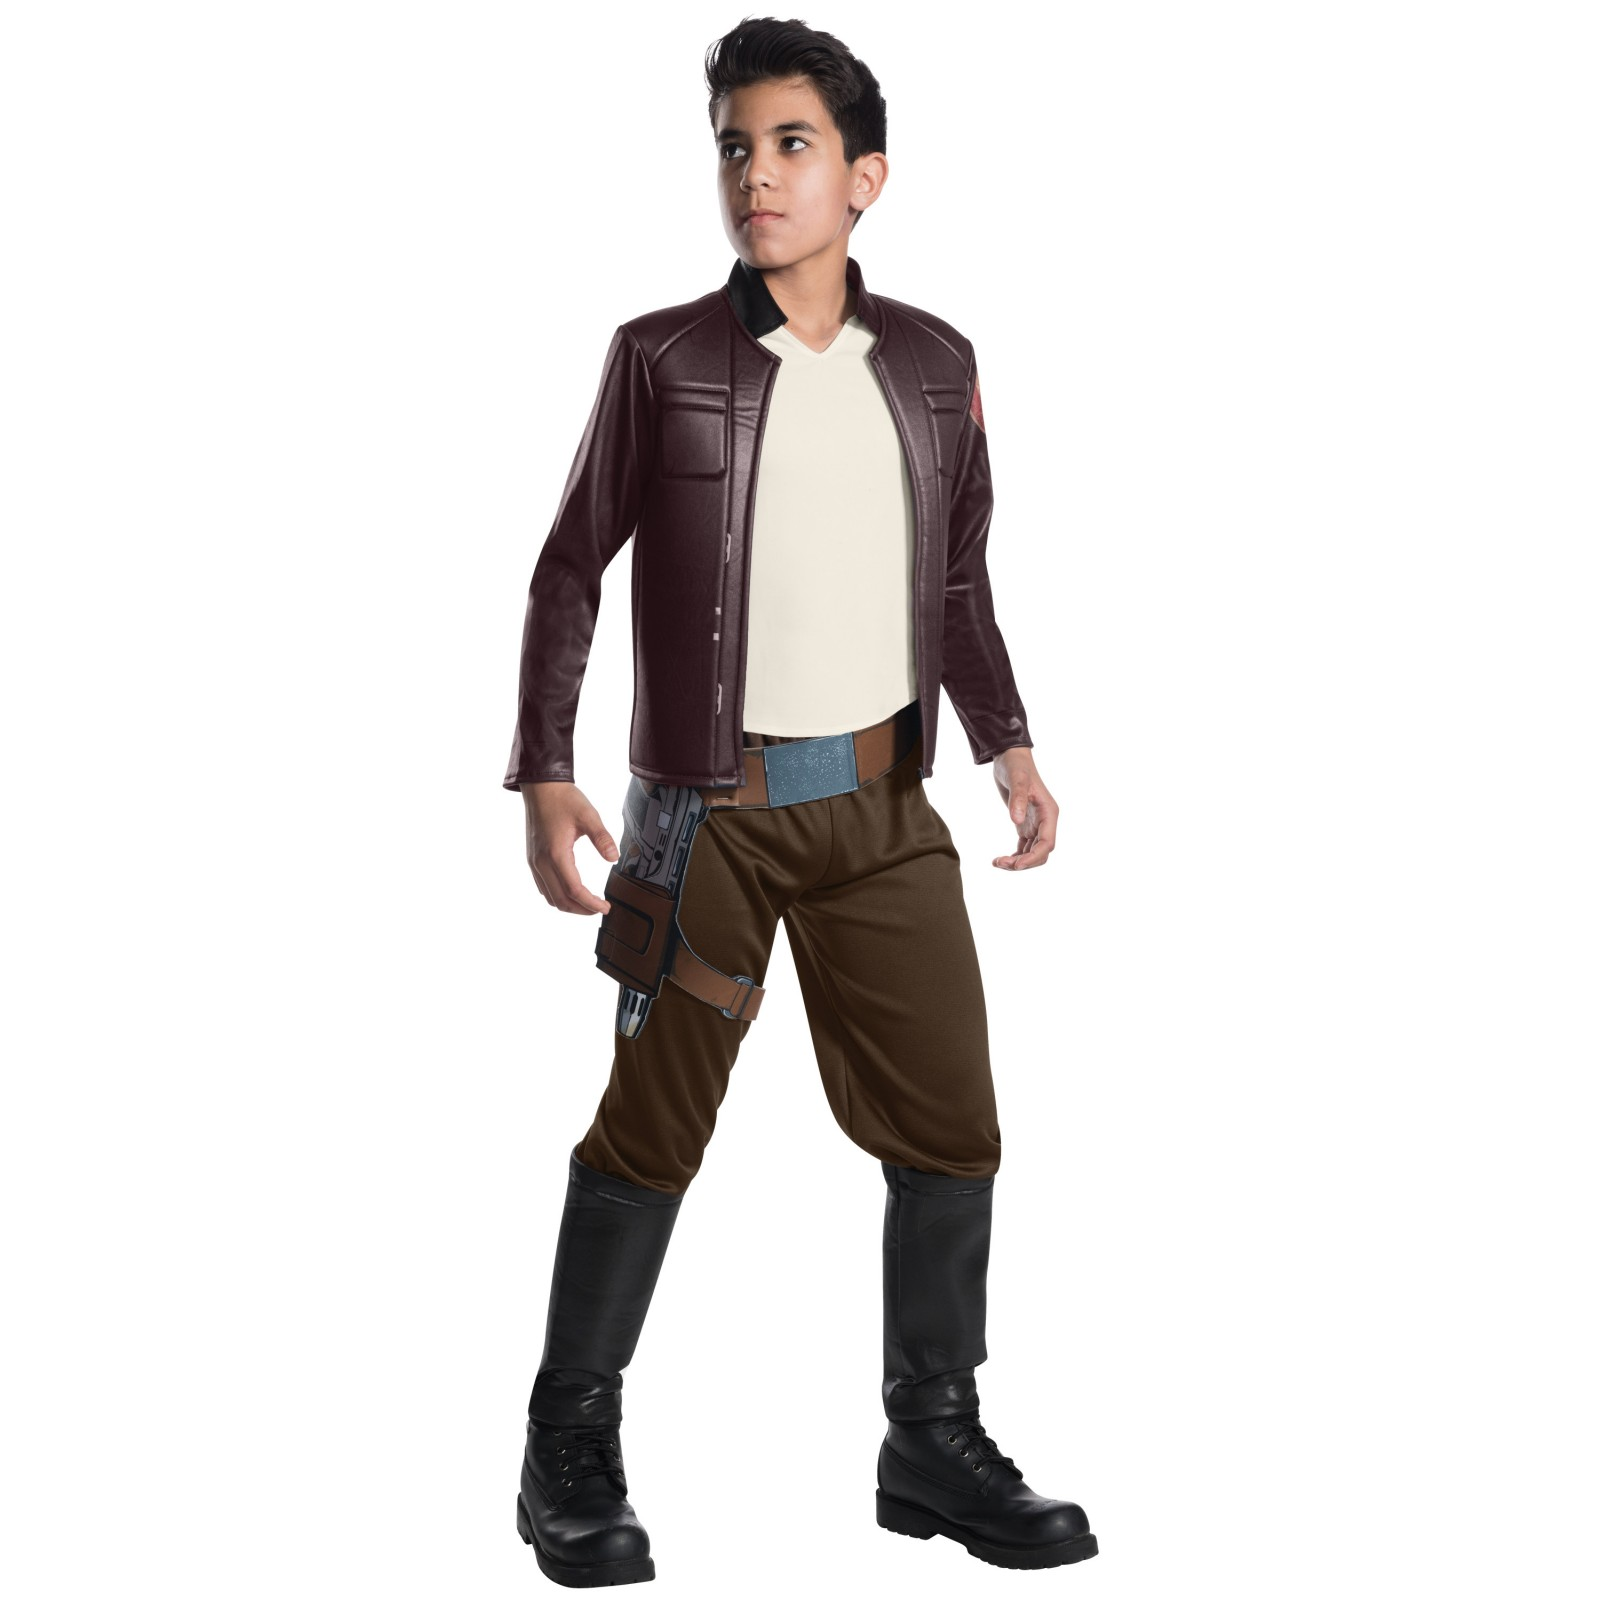 Star Wars Episode VIII - The Last Jedi Deluxe Boy's Poe Dameron Costume